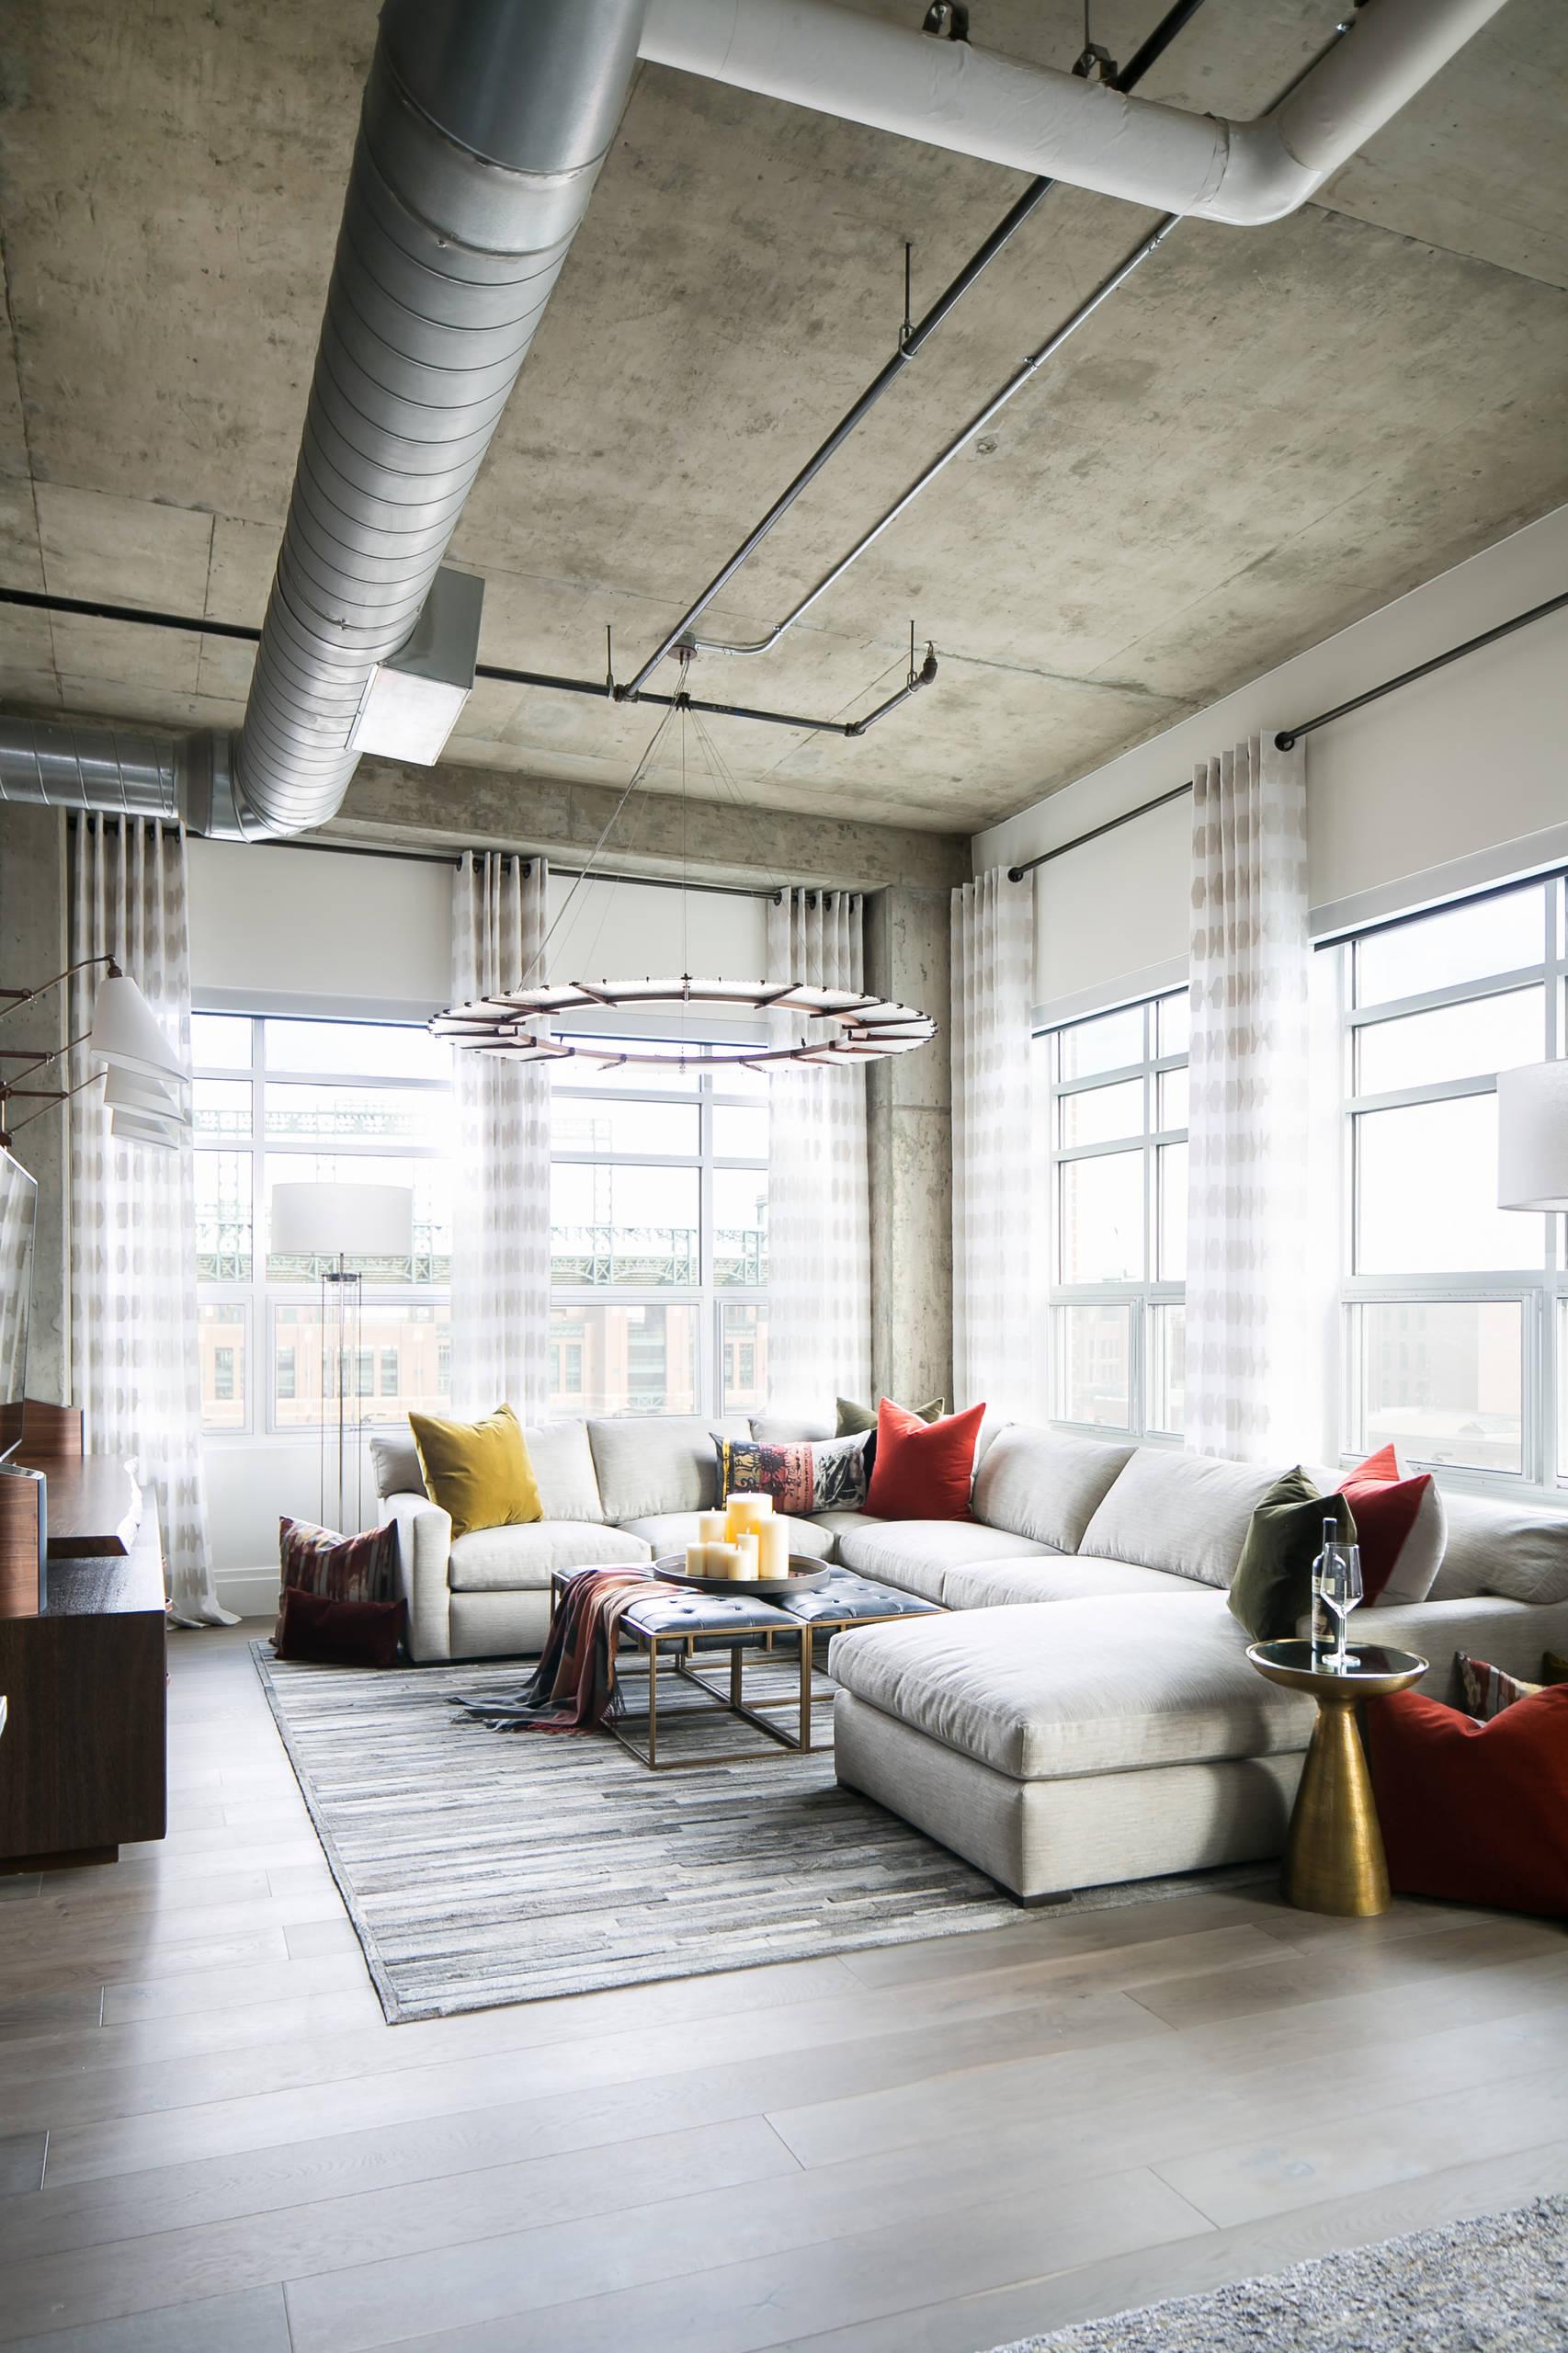 Denver Colorado Residence Loft Style LIVING ROOM